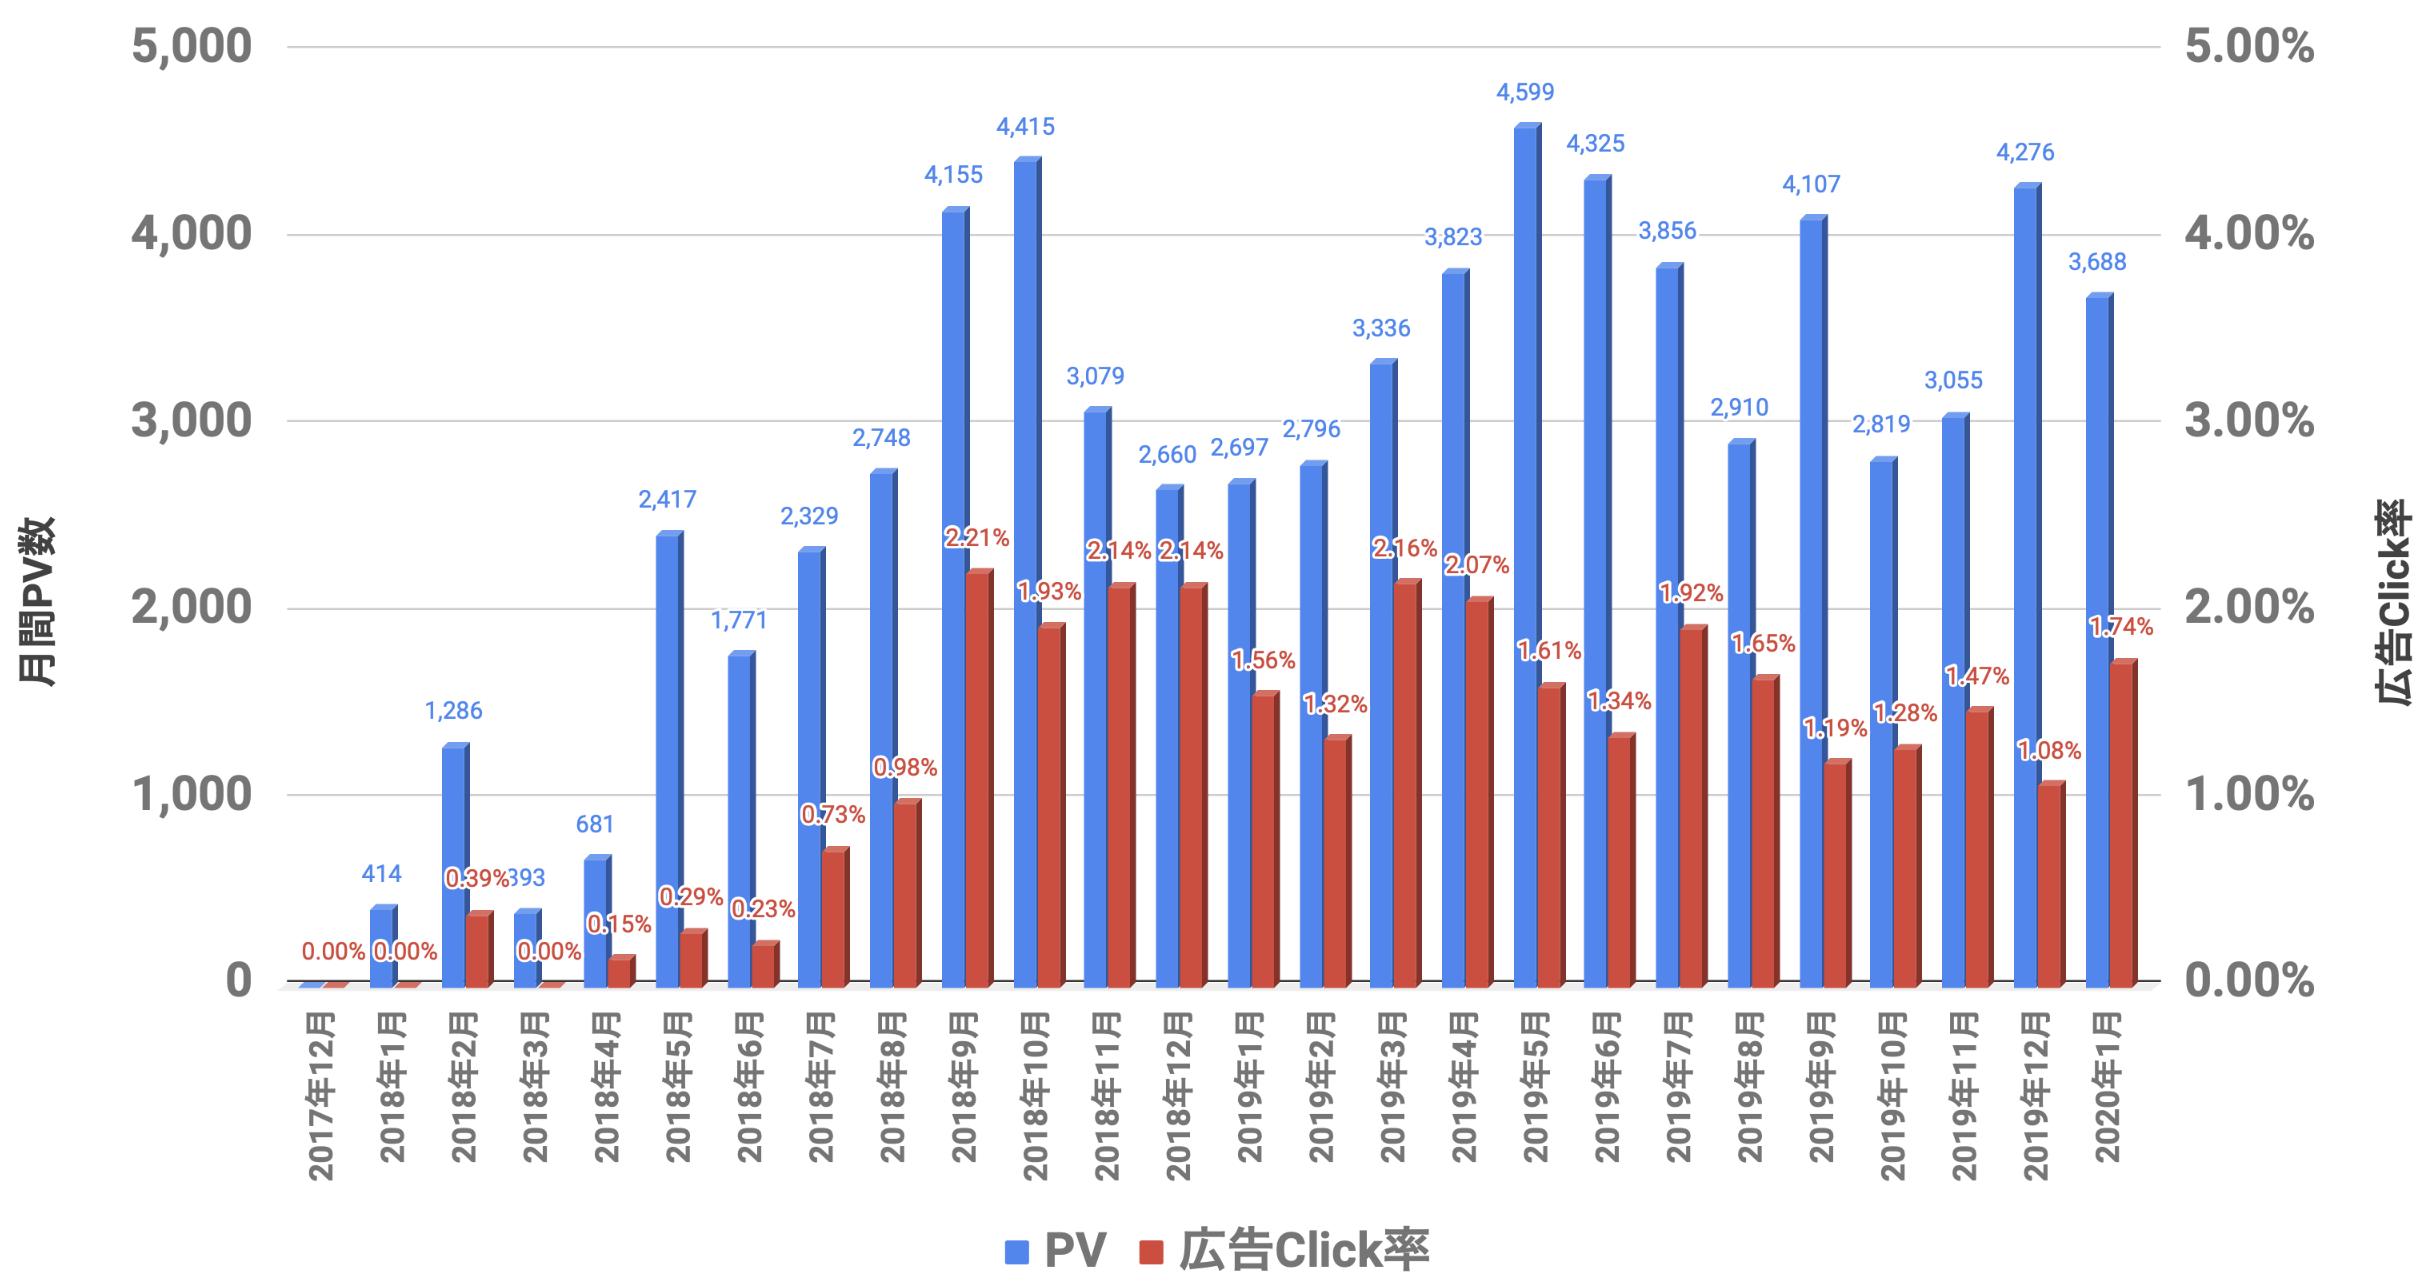 PVと広告Click率 2020年01月